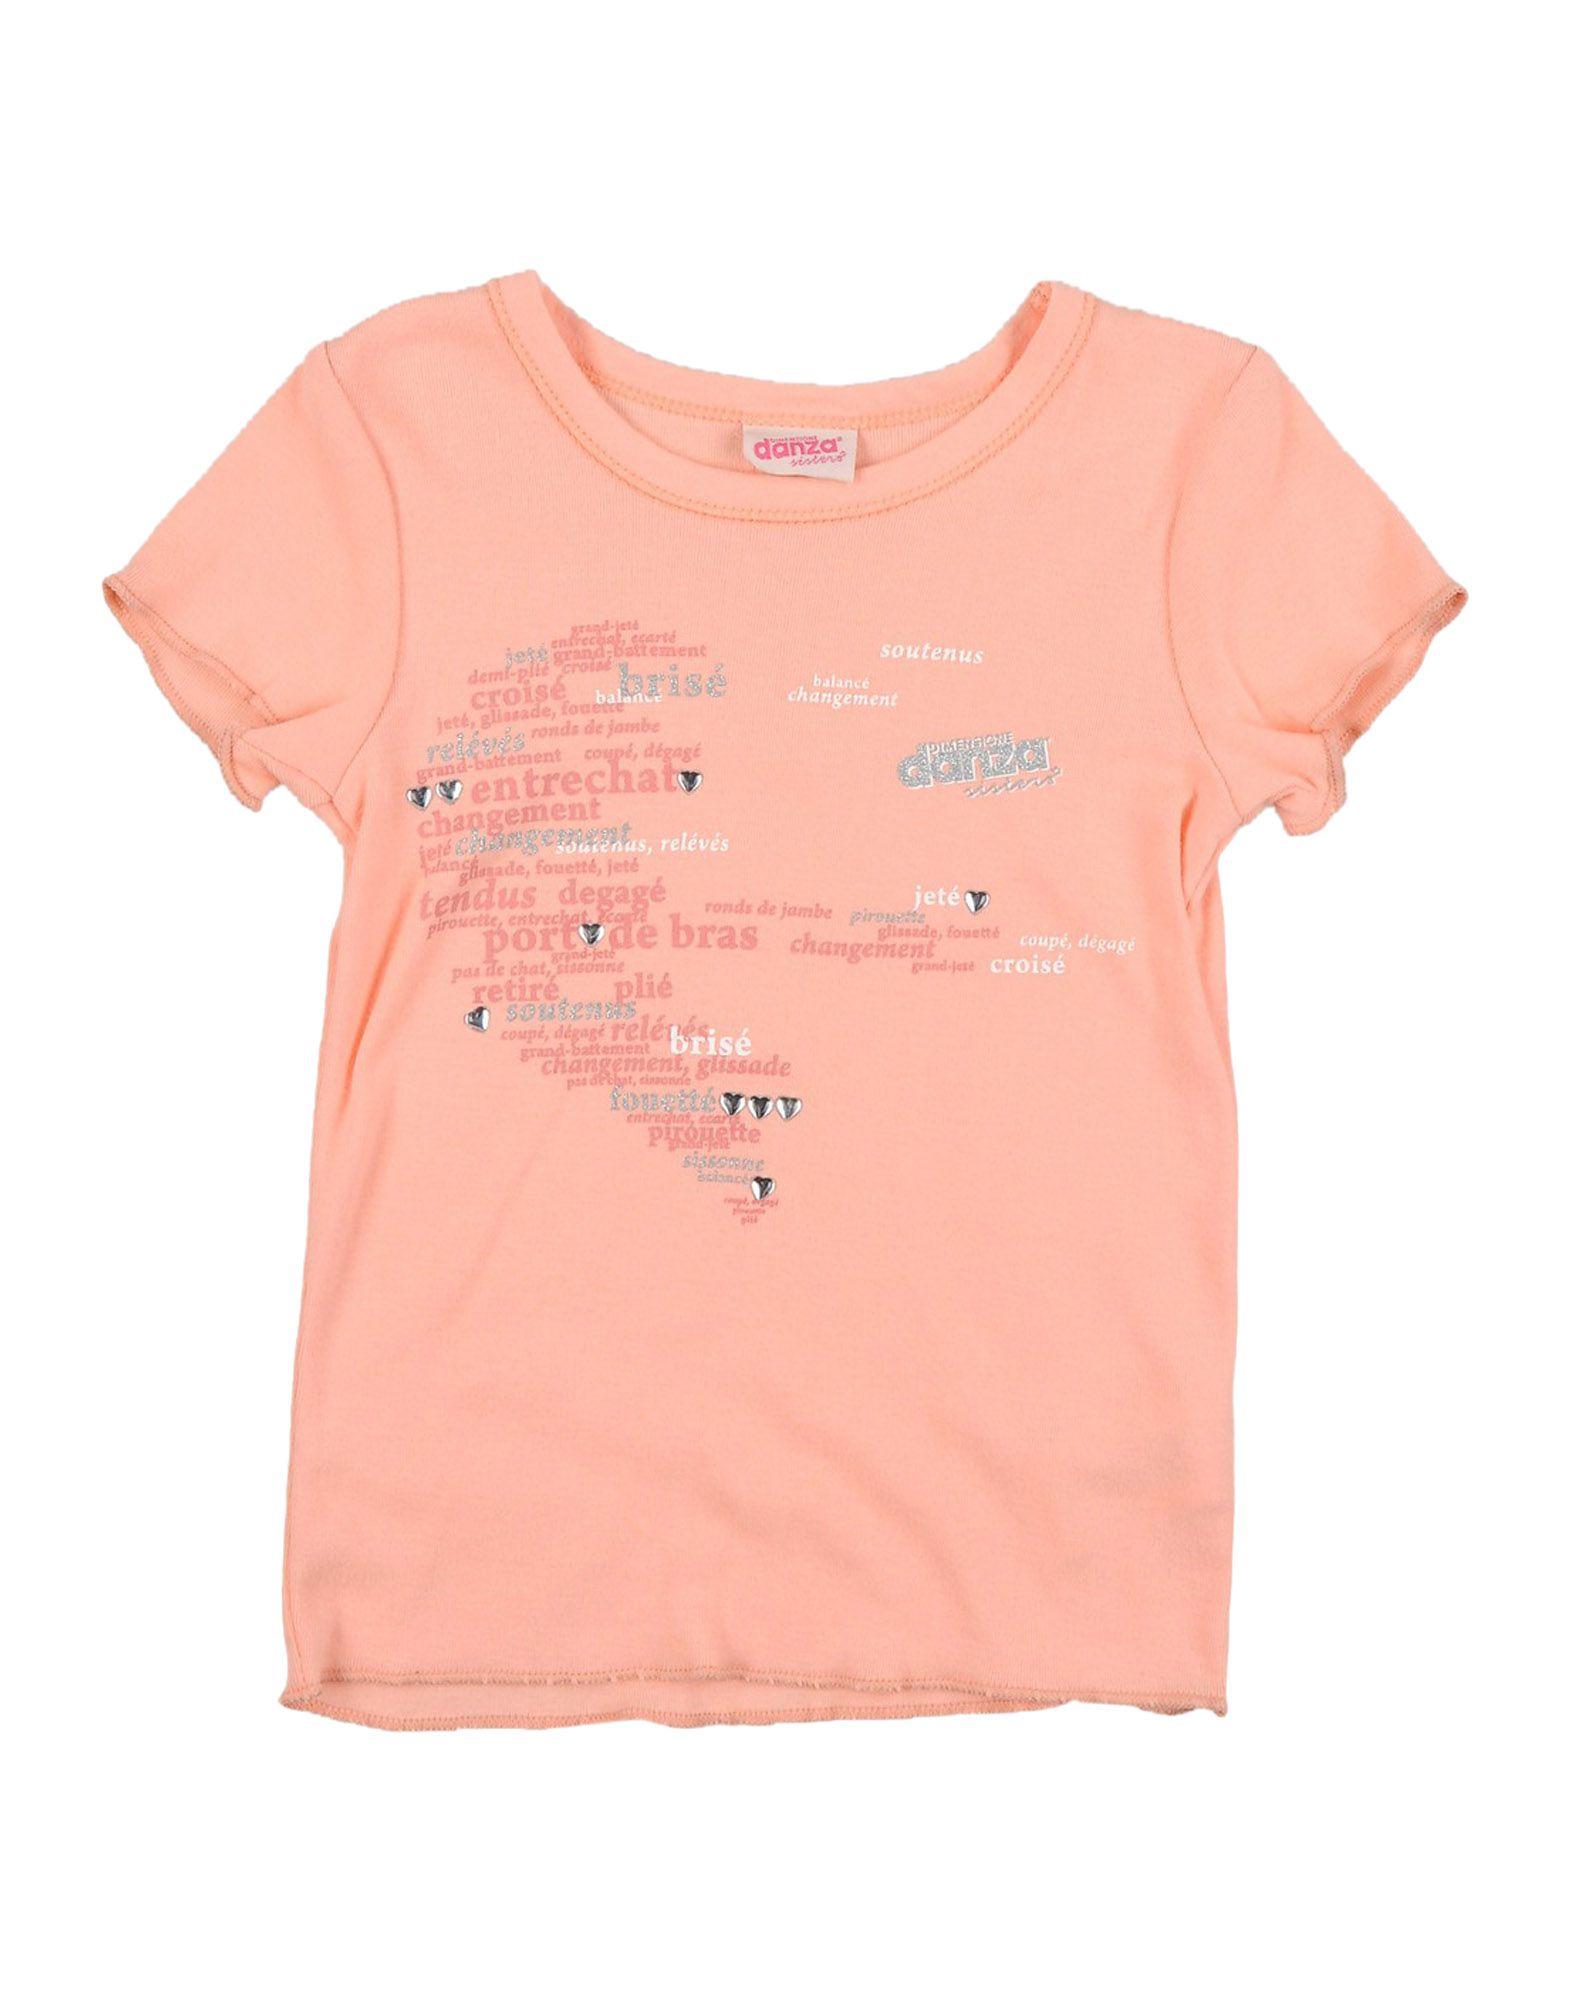 DIMENSIONE DANZA SISTERS Mädchen 0-24 monate T-shirts Farbe Pfirsich Größe 10